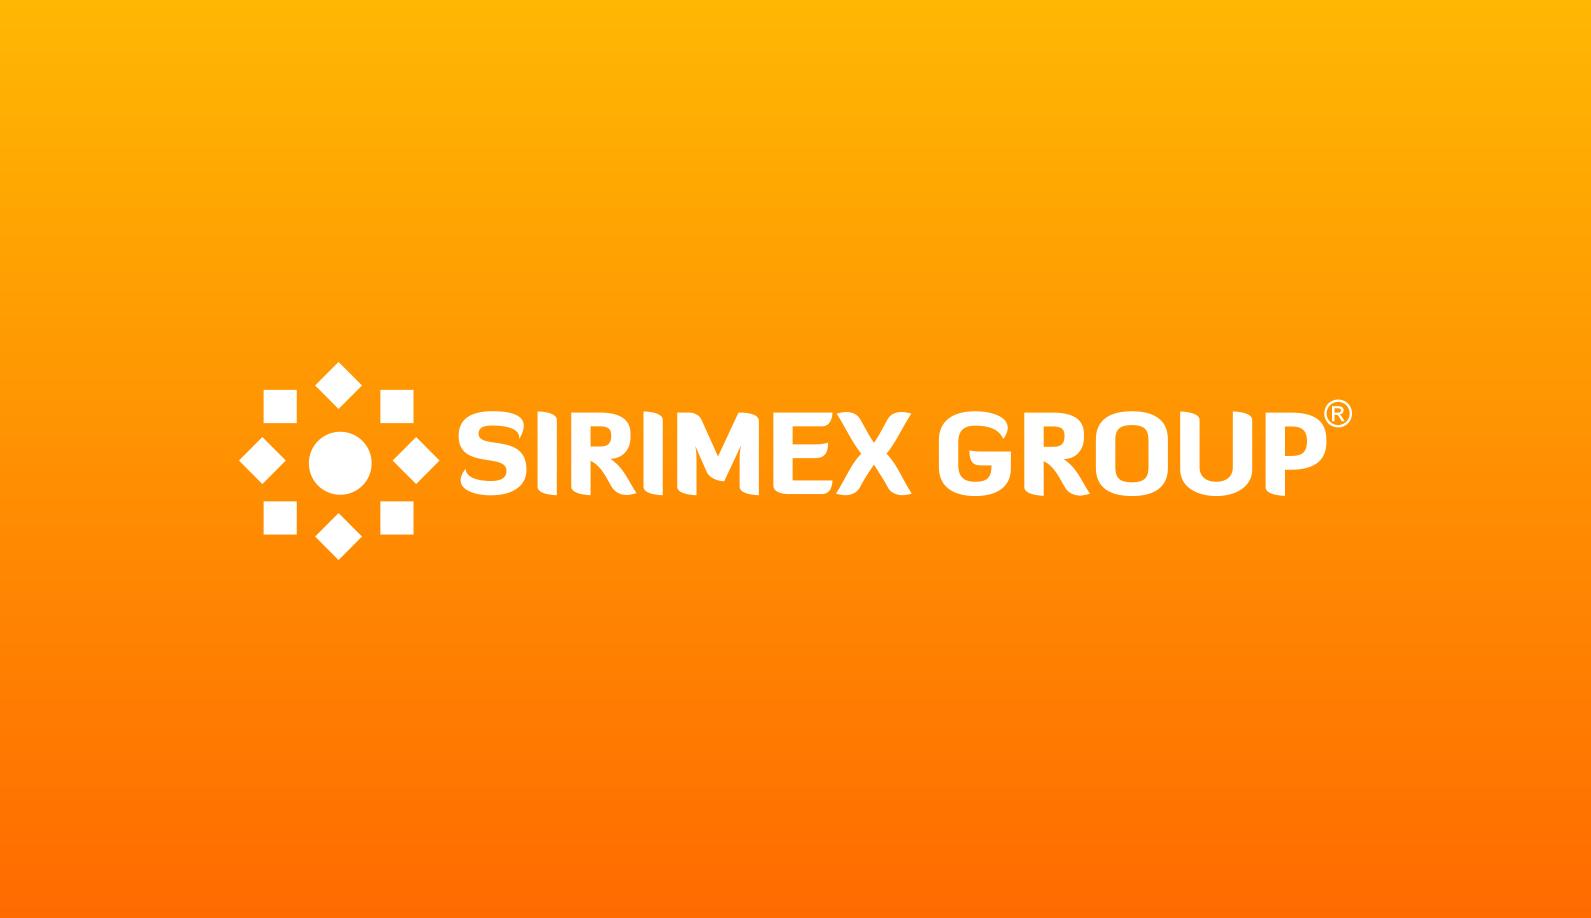 Sirimex Group